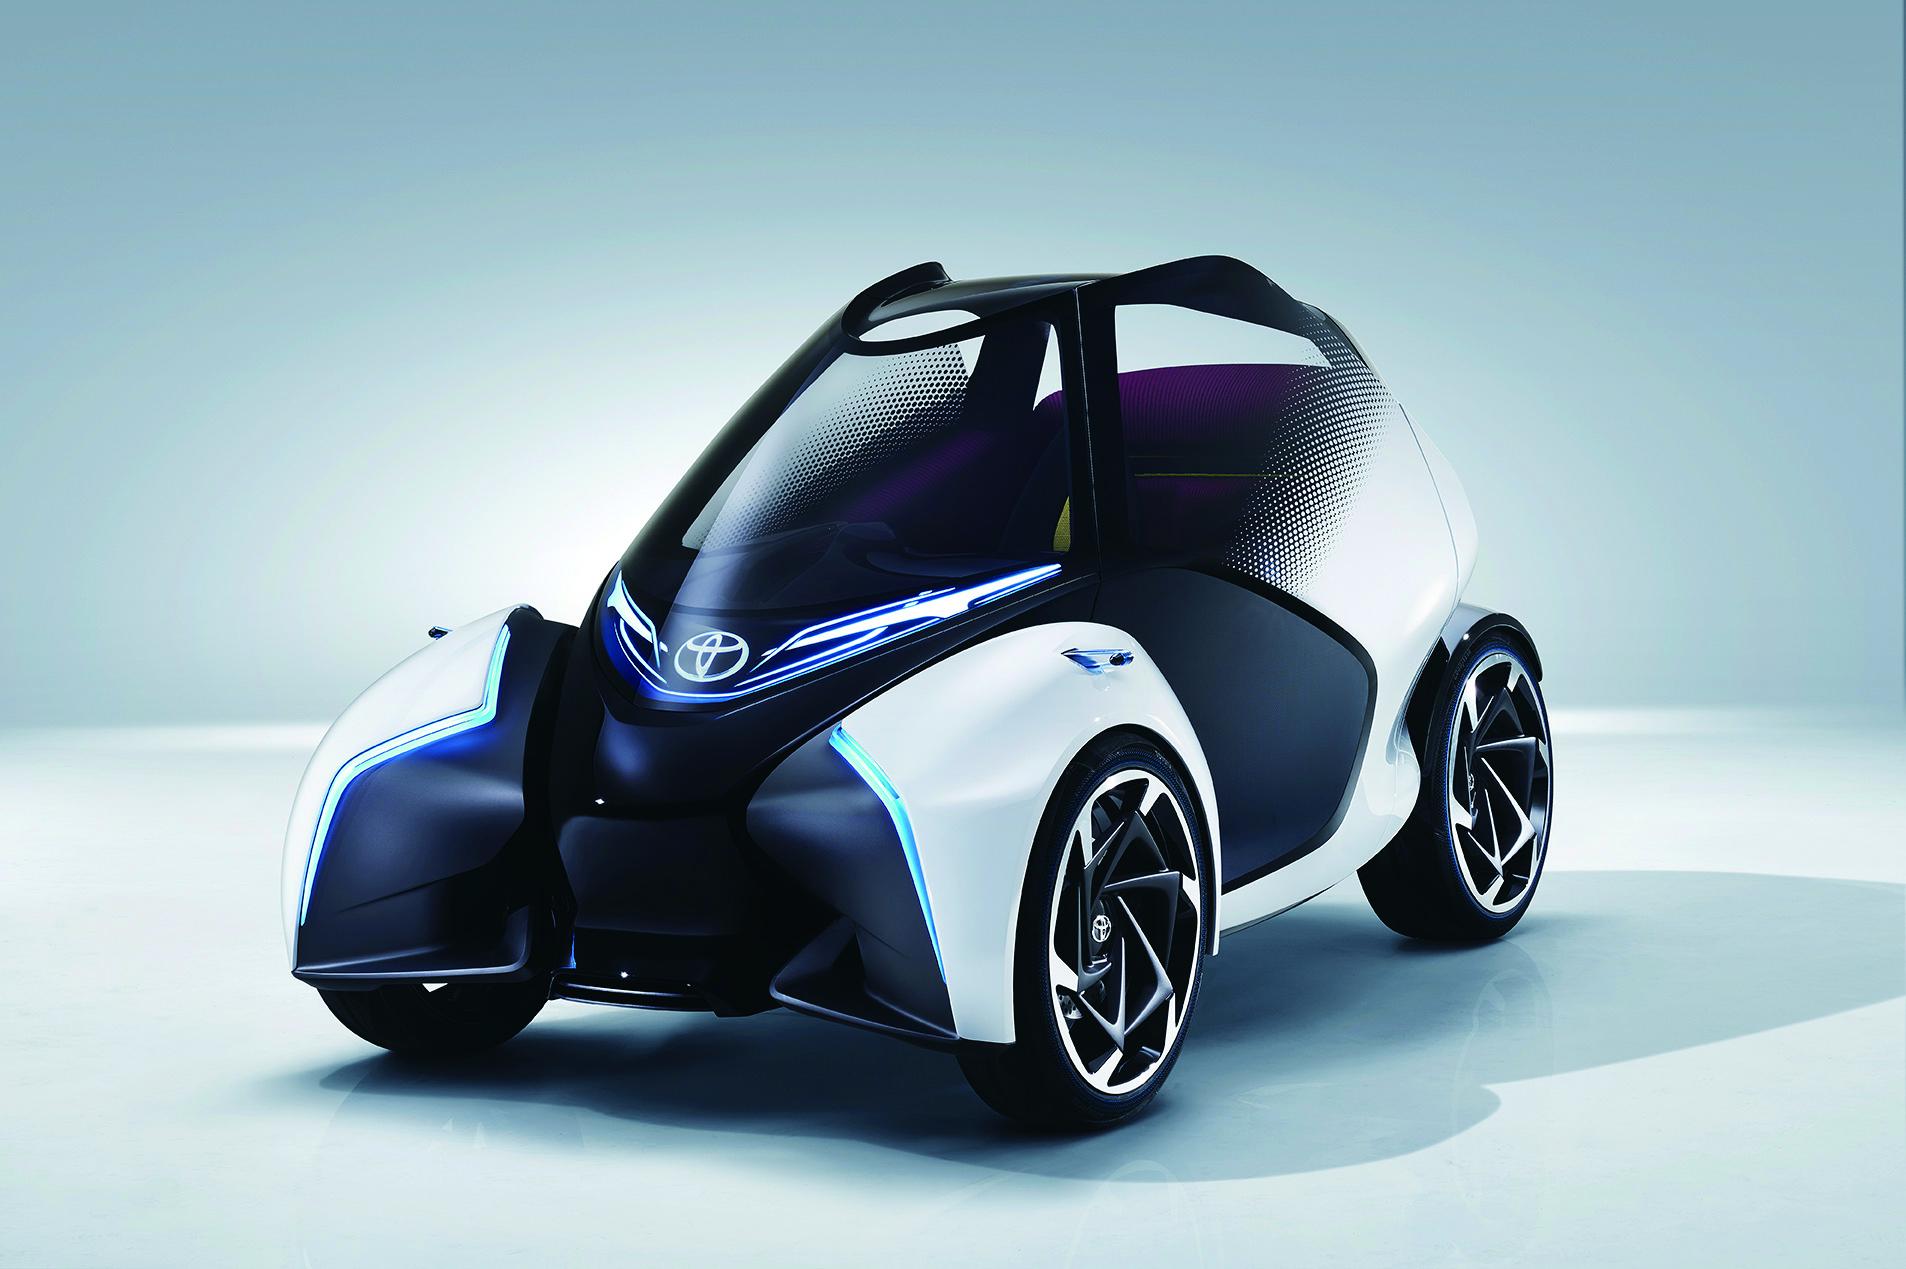 2017-toyota-concept-i-tril-static-02.jpg